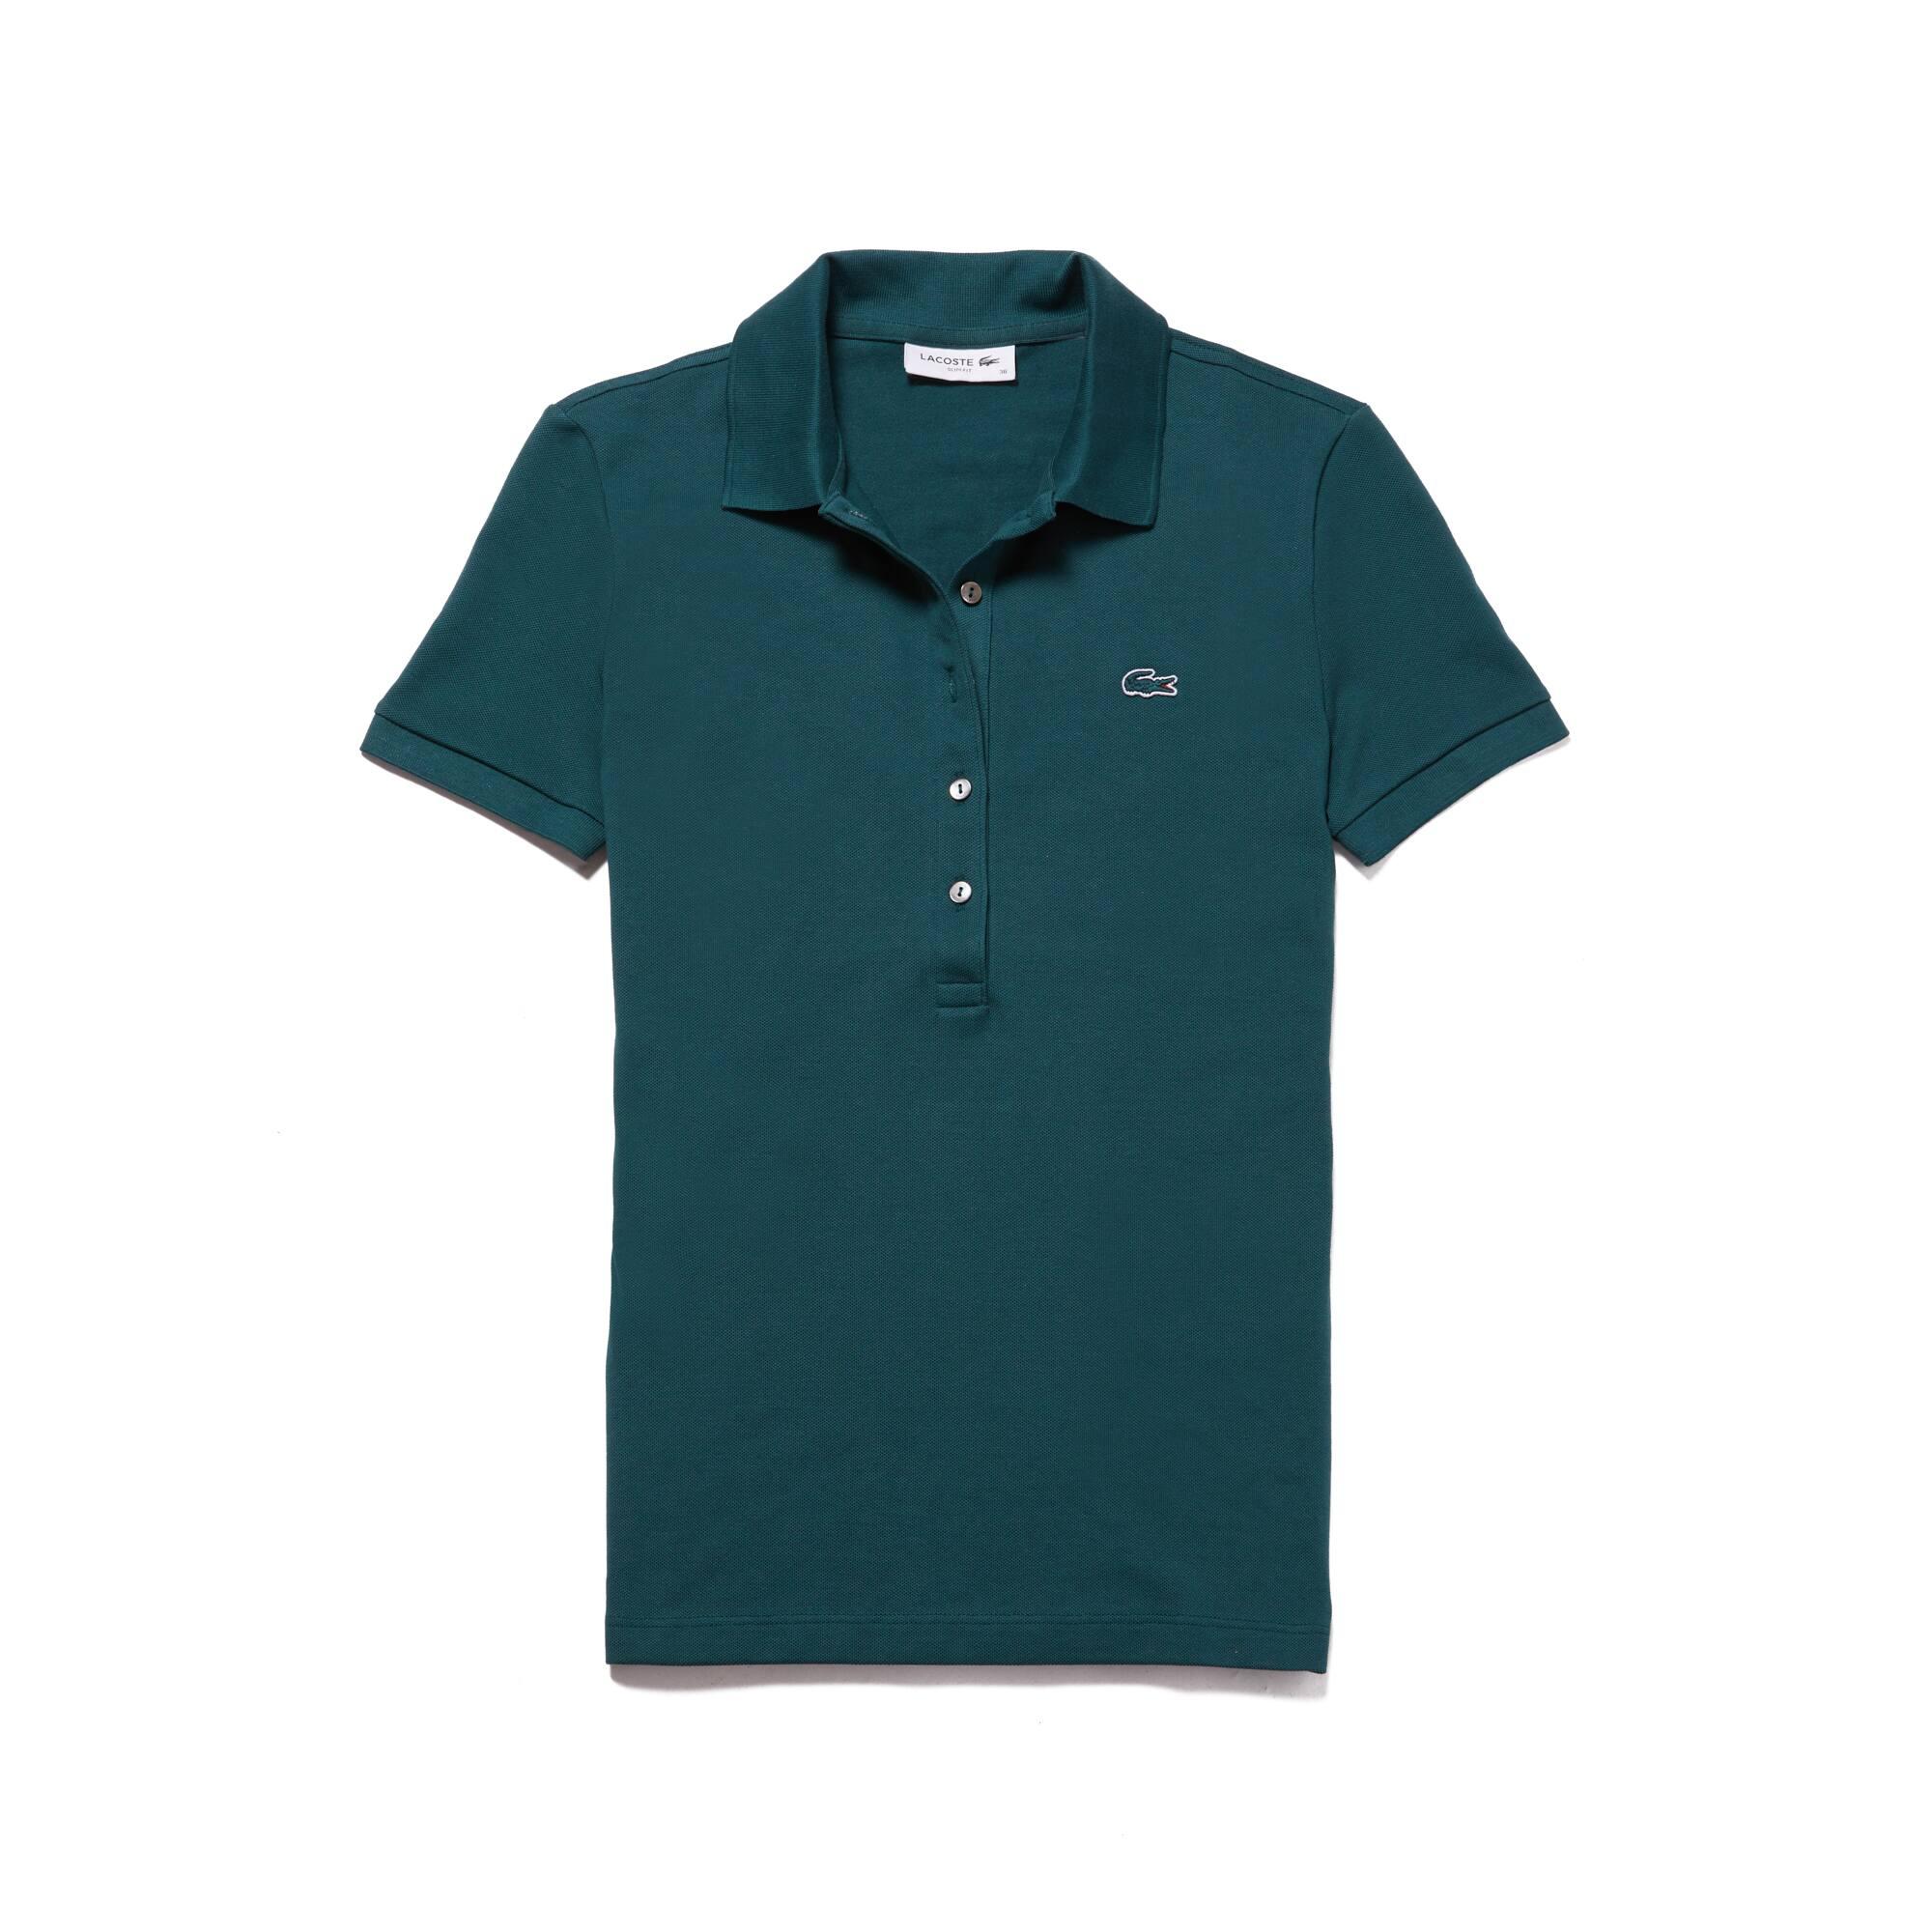 82158856e53b Poloshirts für Damen   Damenmode   LACOSTE